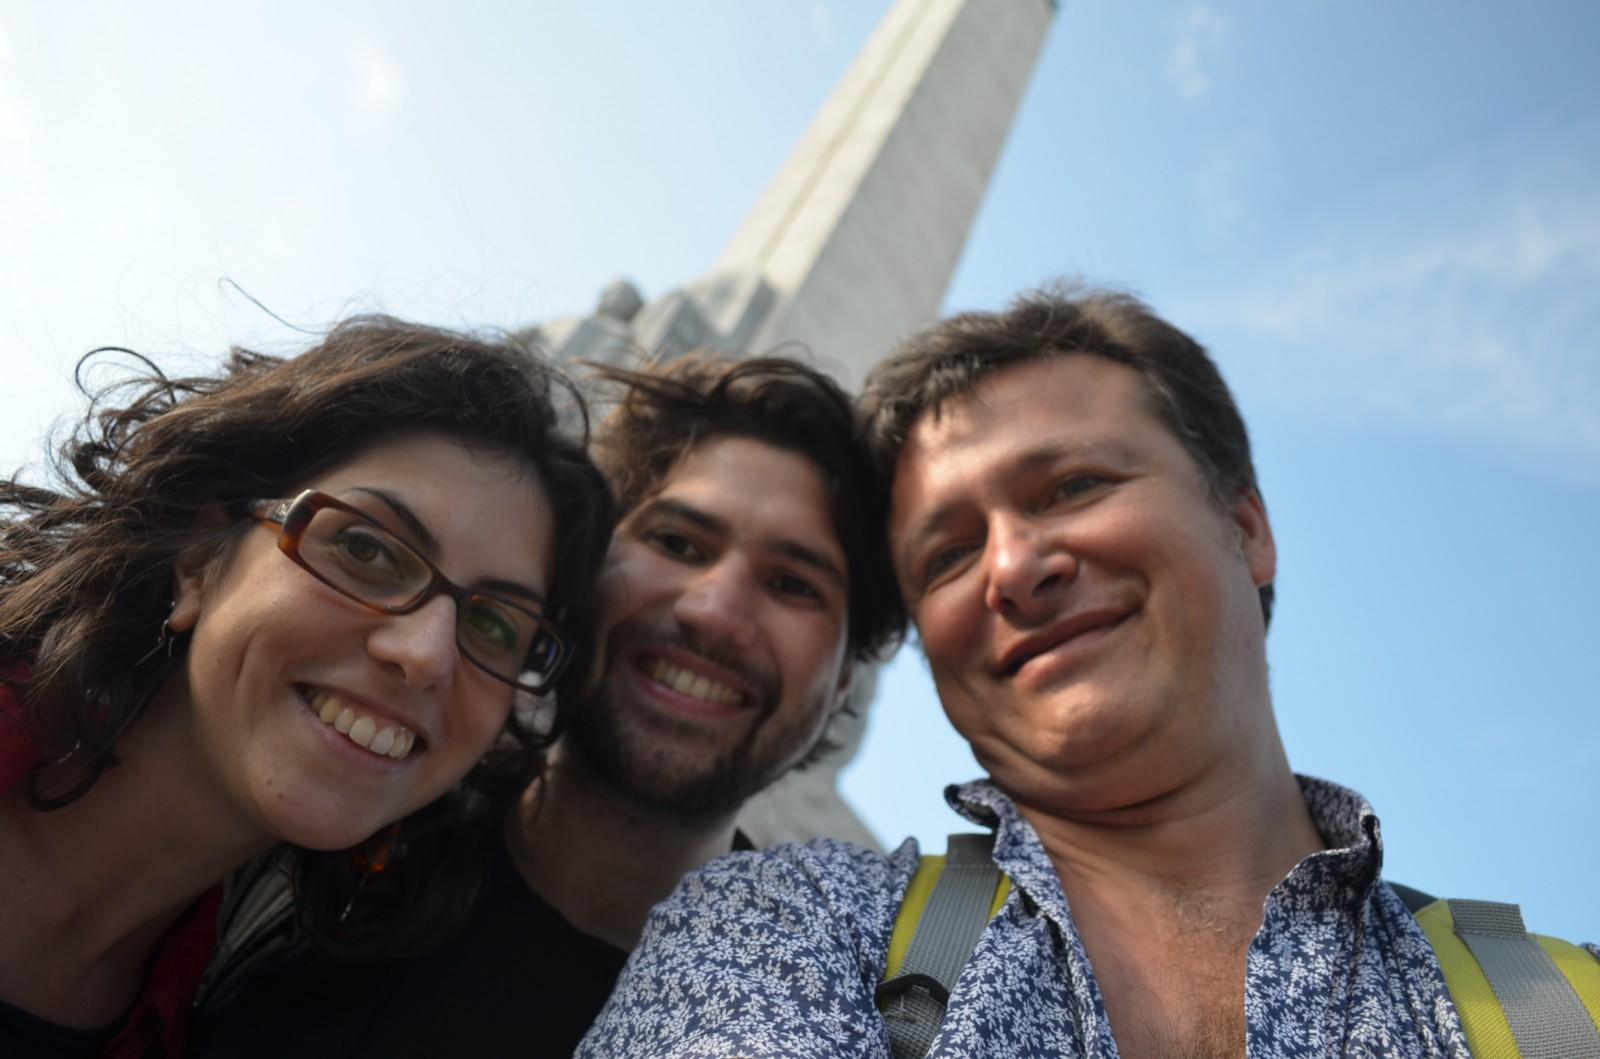 Giselda, Cristian and Cosmin